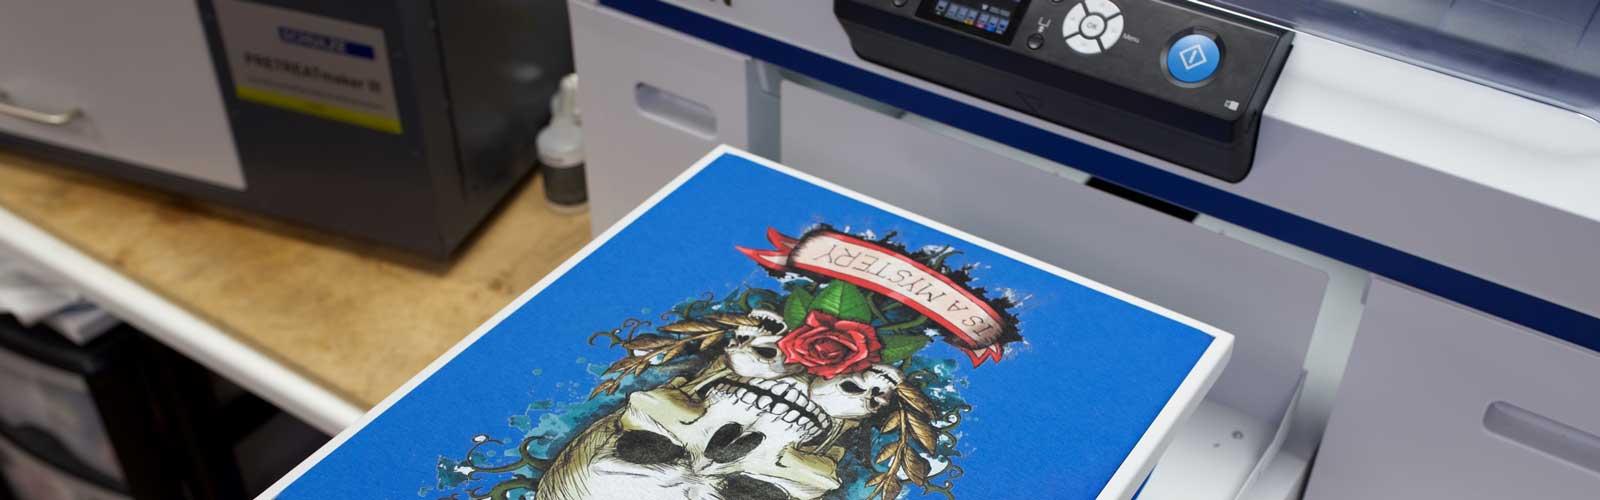 tricouri personalizate prin tehnologia dtg , printate direct in tesatura